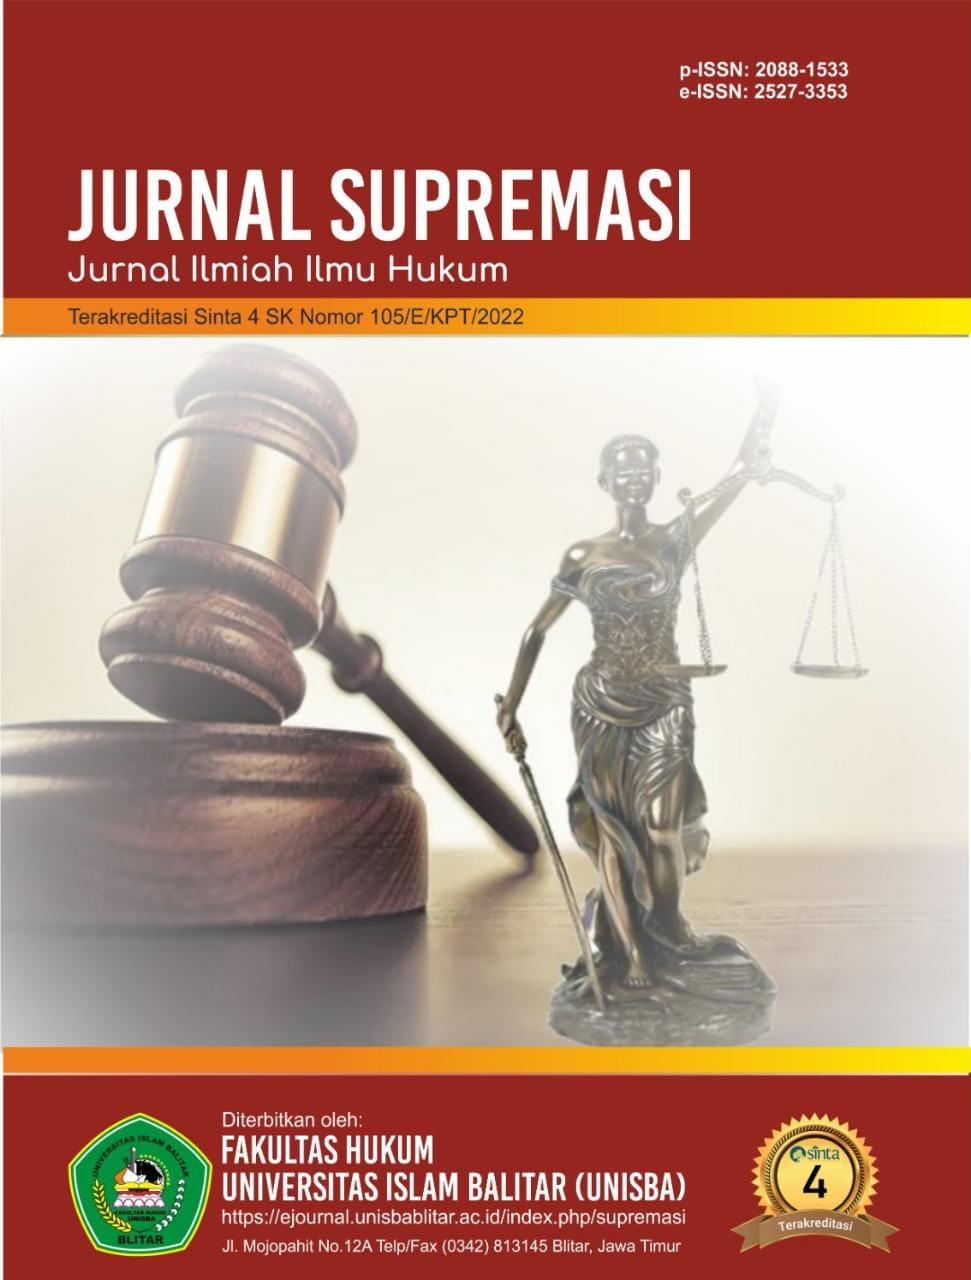 Jurnal Supremasi: Jurnal Ilmiah Ilmu Hukum